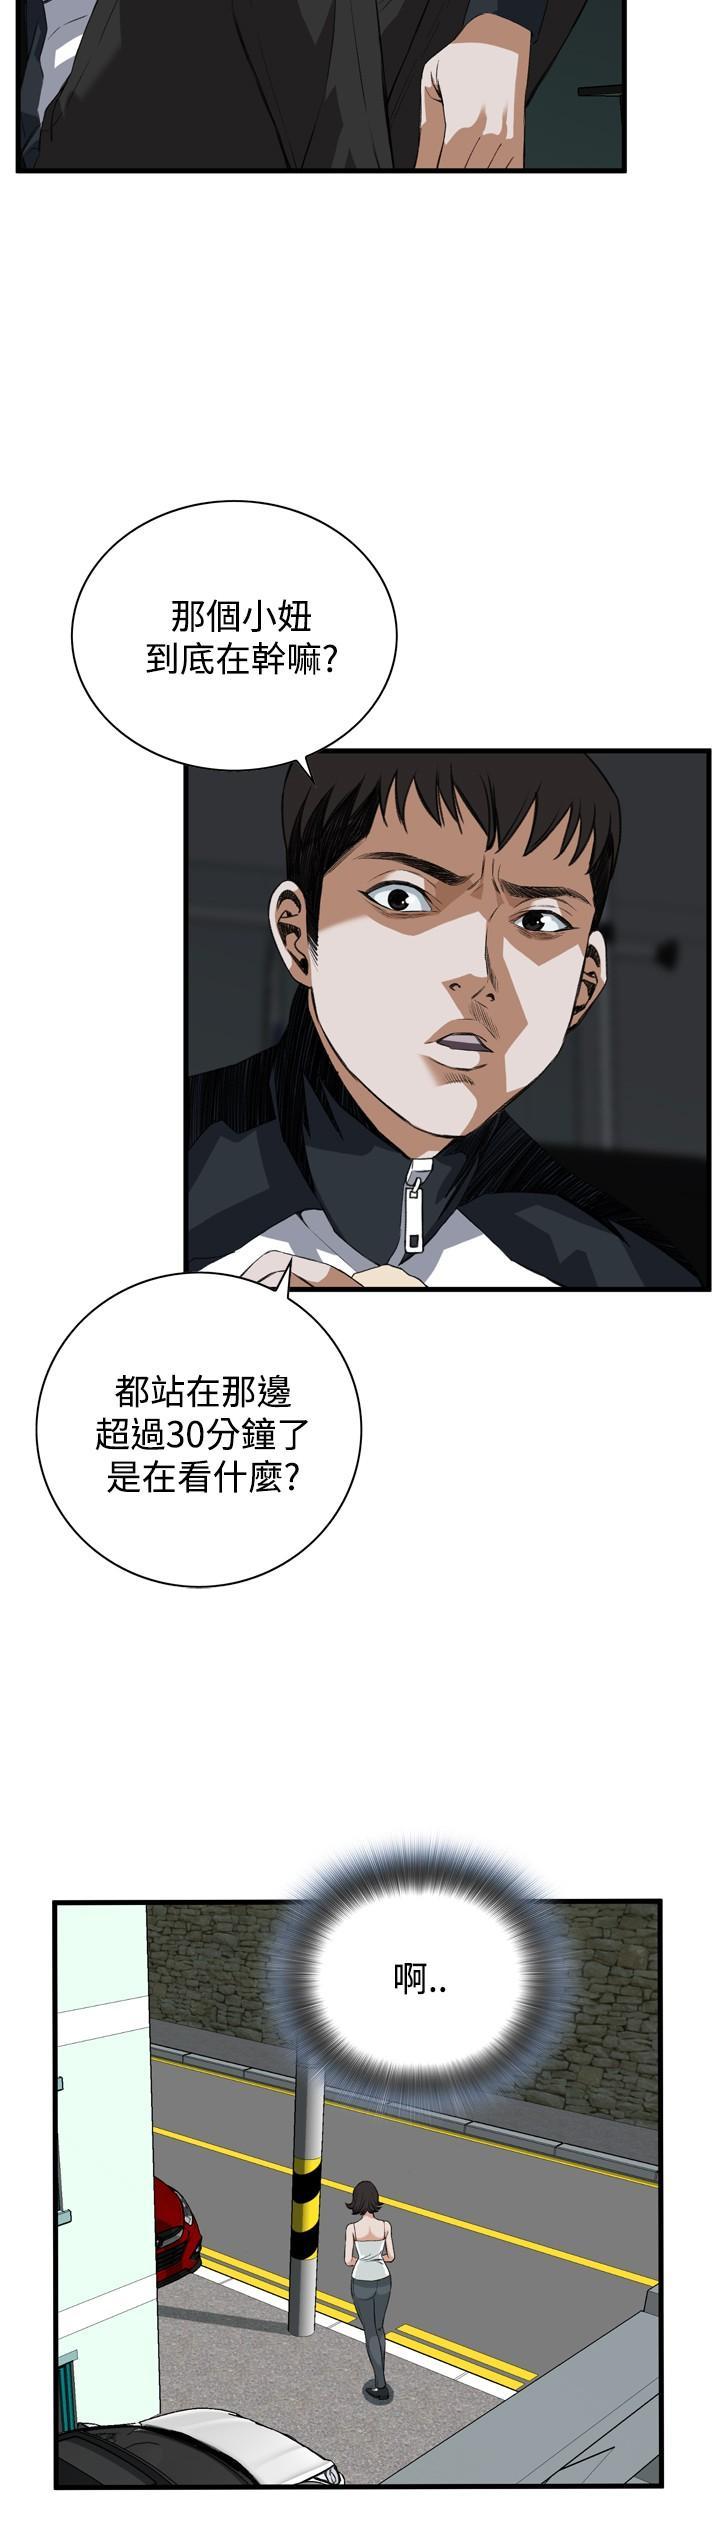 Take a Peek 偷窥 Ch.39~51 [Chinese]中文 218